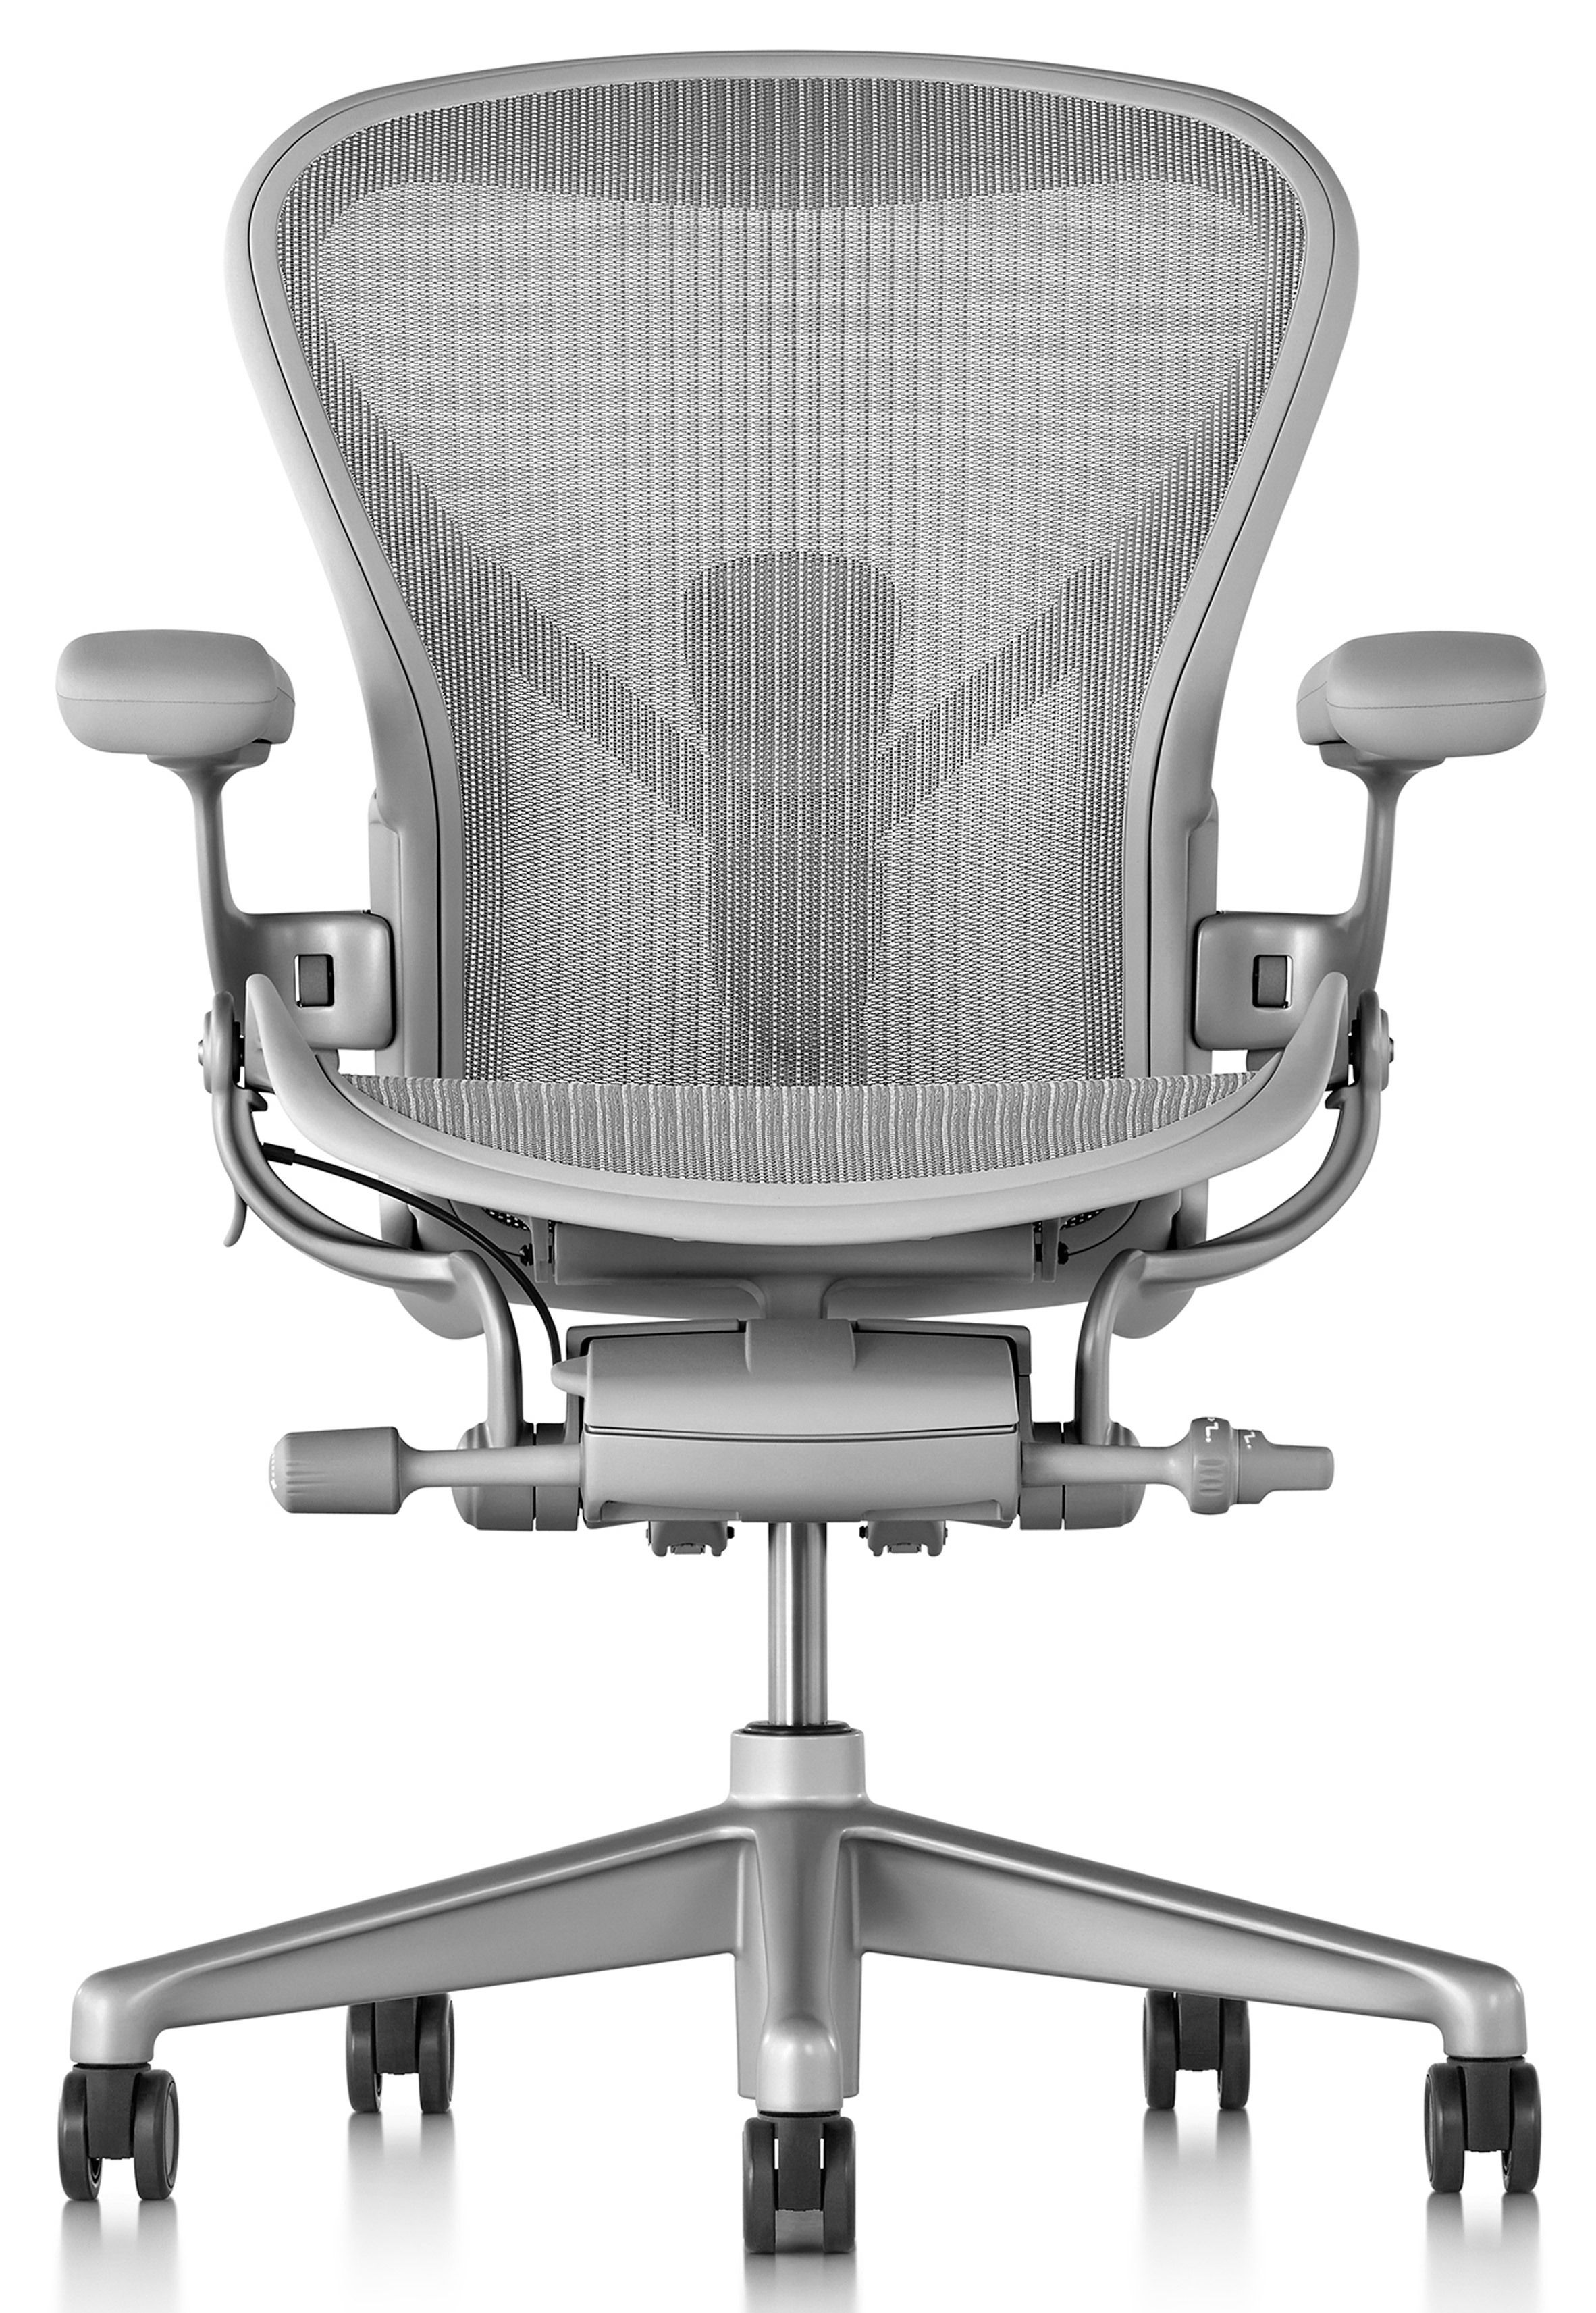 herman miller desk chairs dxracer computer chair updates iconic aeron office  f u r